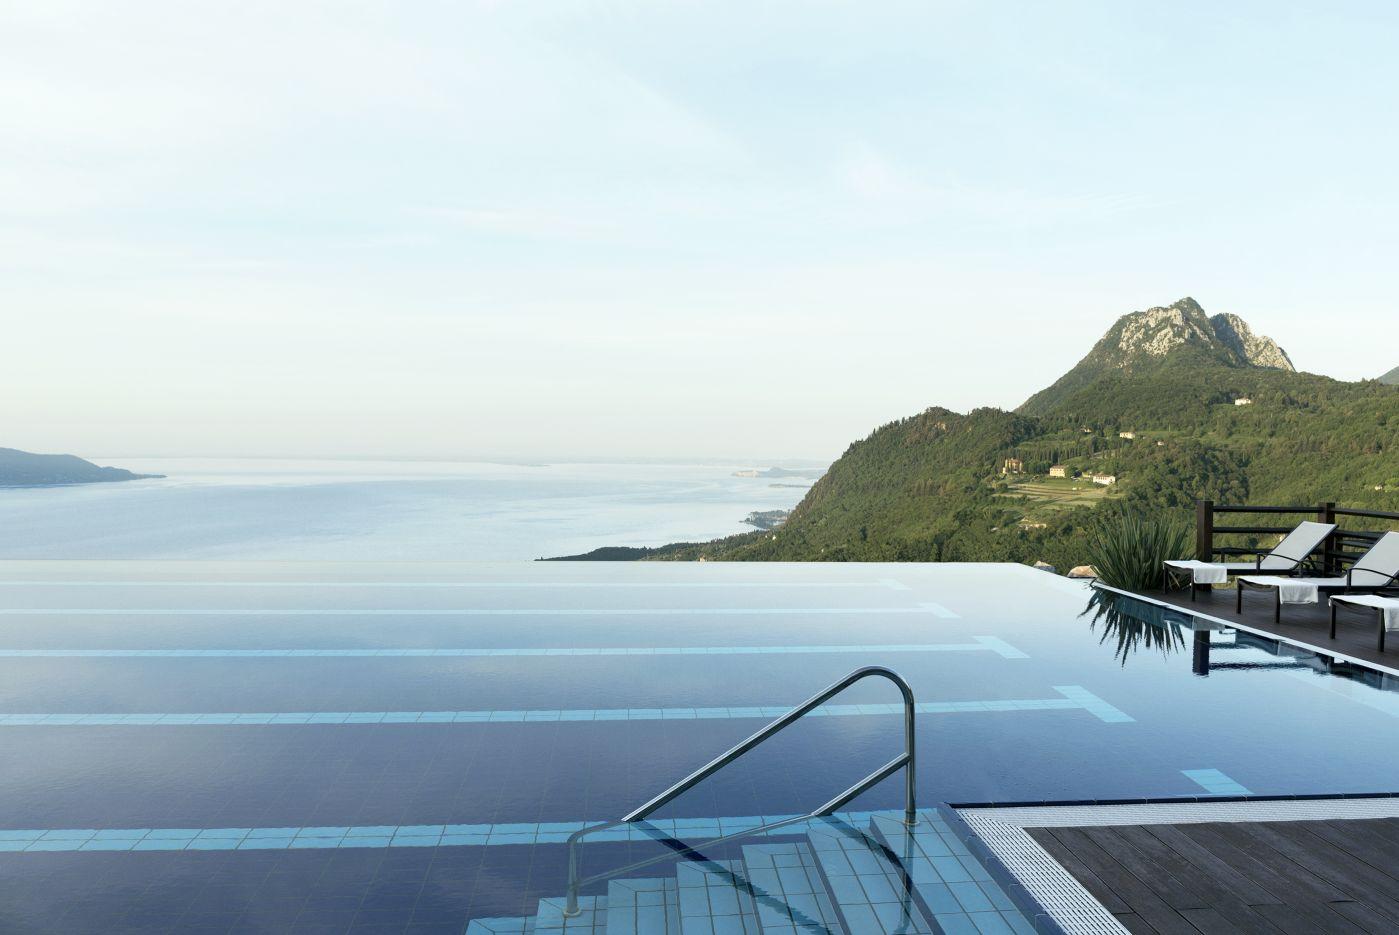 A tu per tu con Lefay Resorts, main sponsor della Transbenaco!